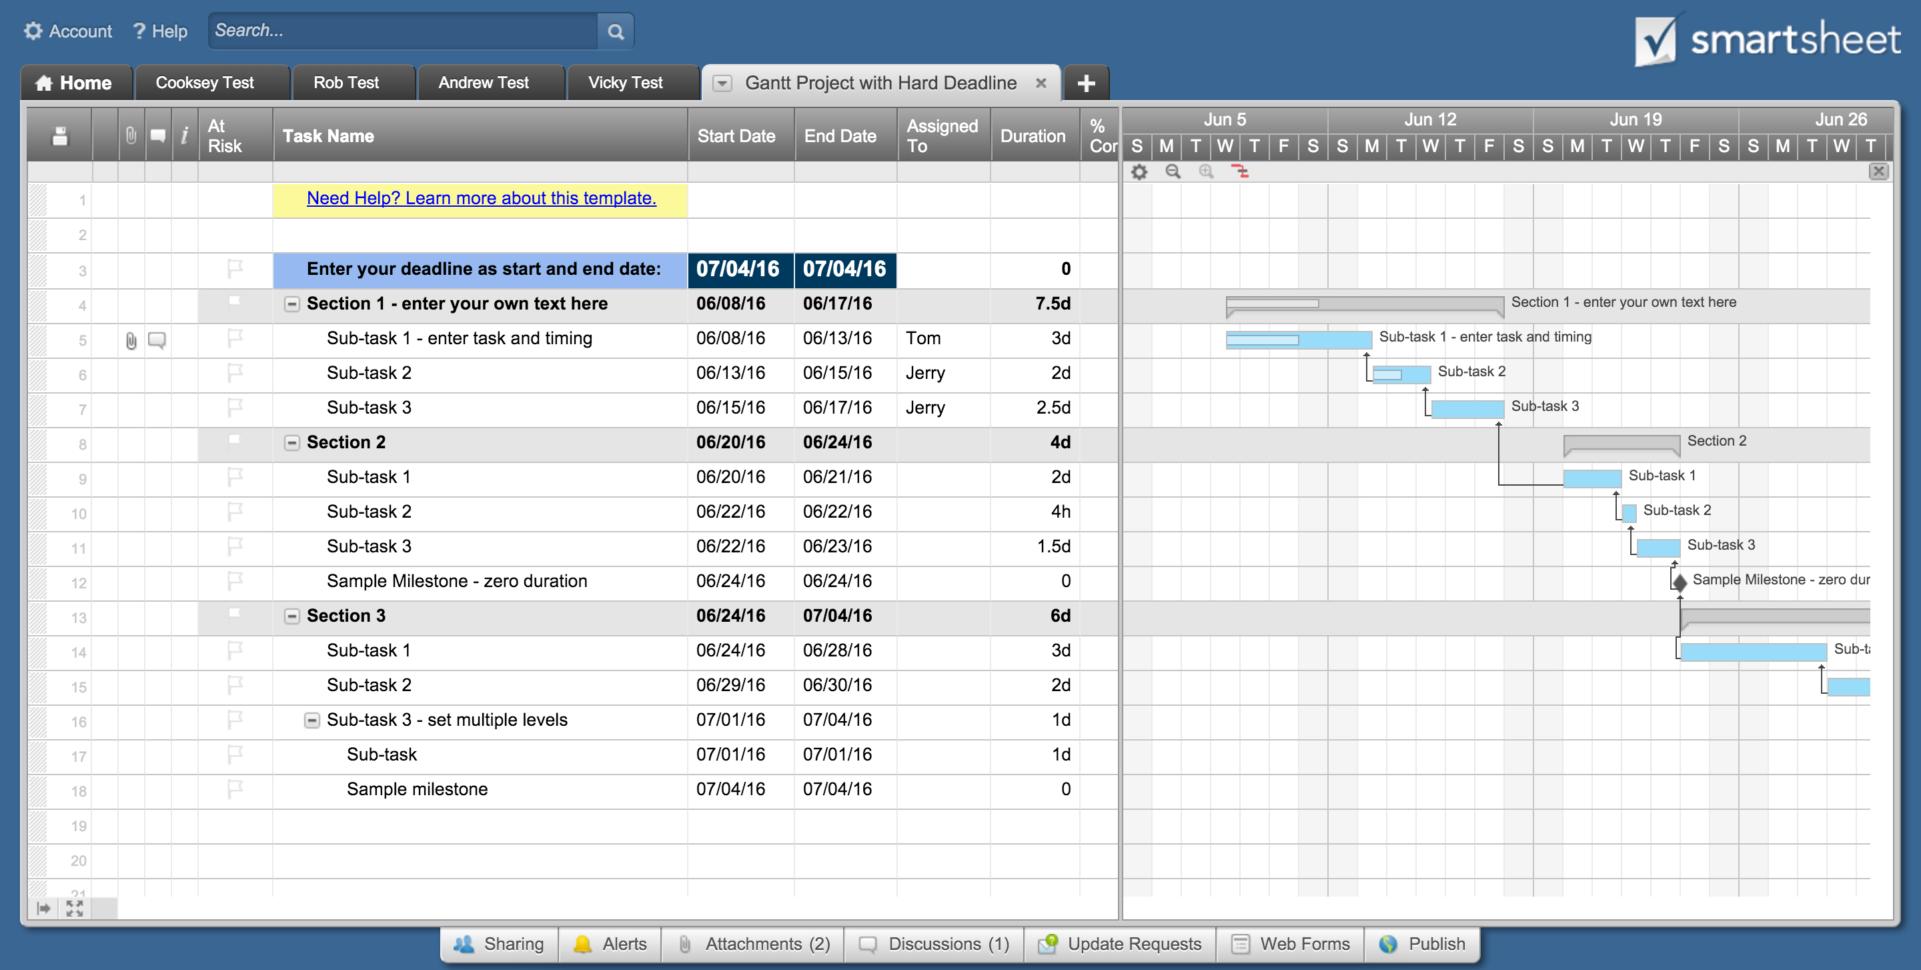 Shareware Spreadsheet Regarding From Visicalc To Google Sheets: The 12 Best Spreadsheet Apps